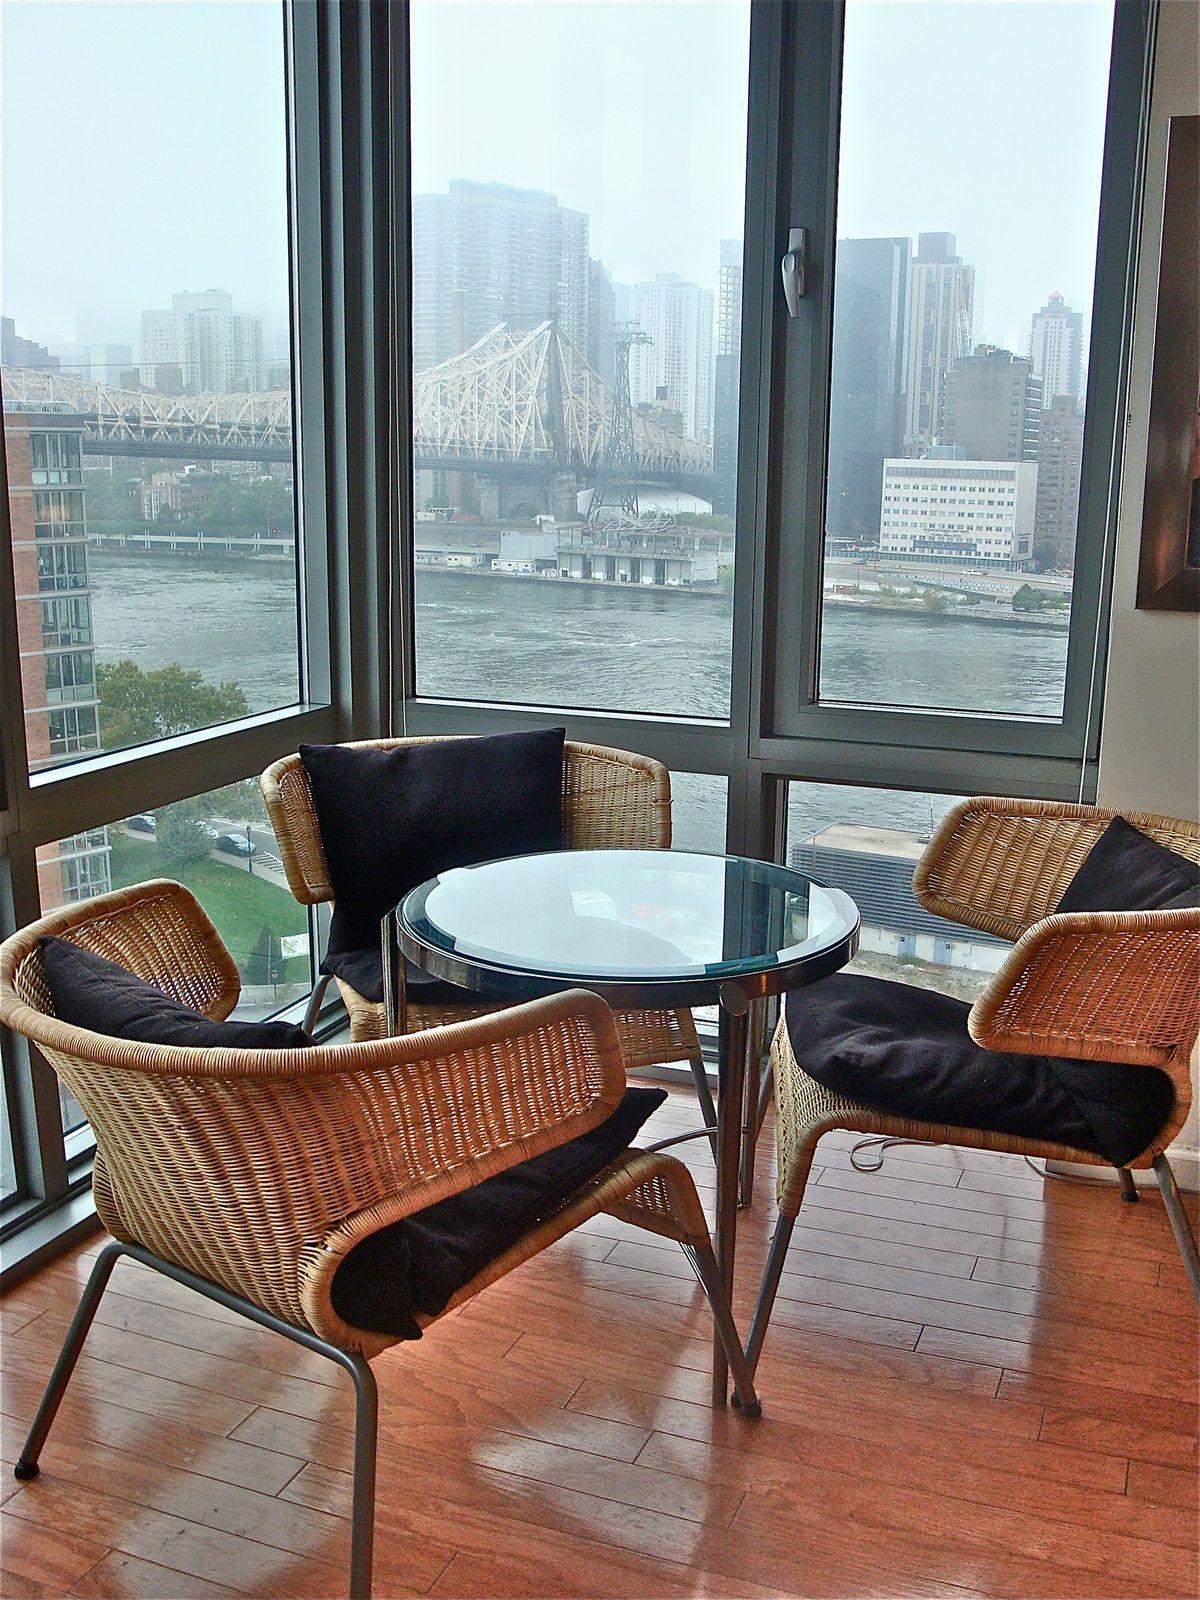 Bridge View Artists Abode